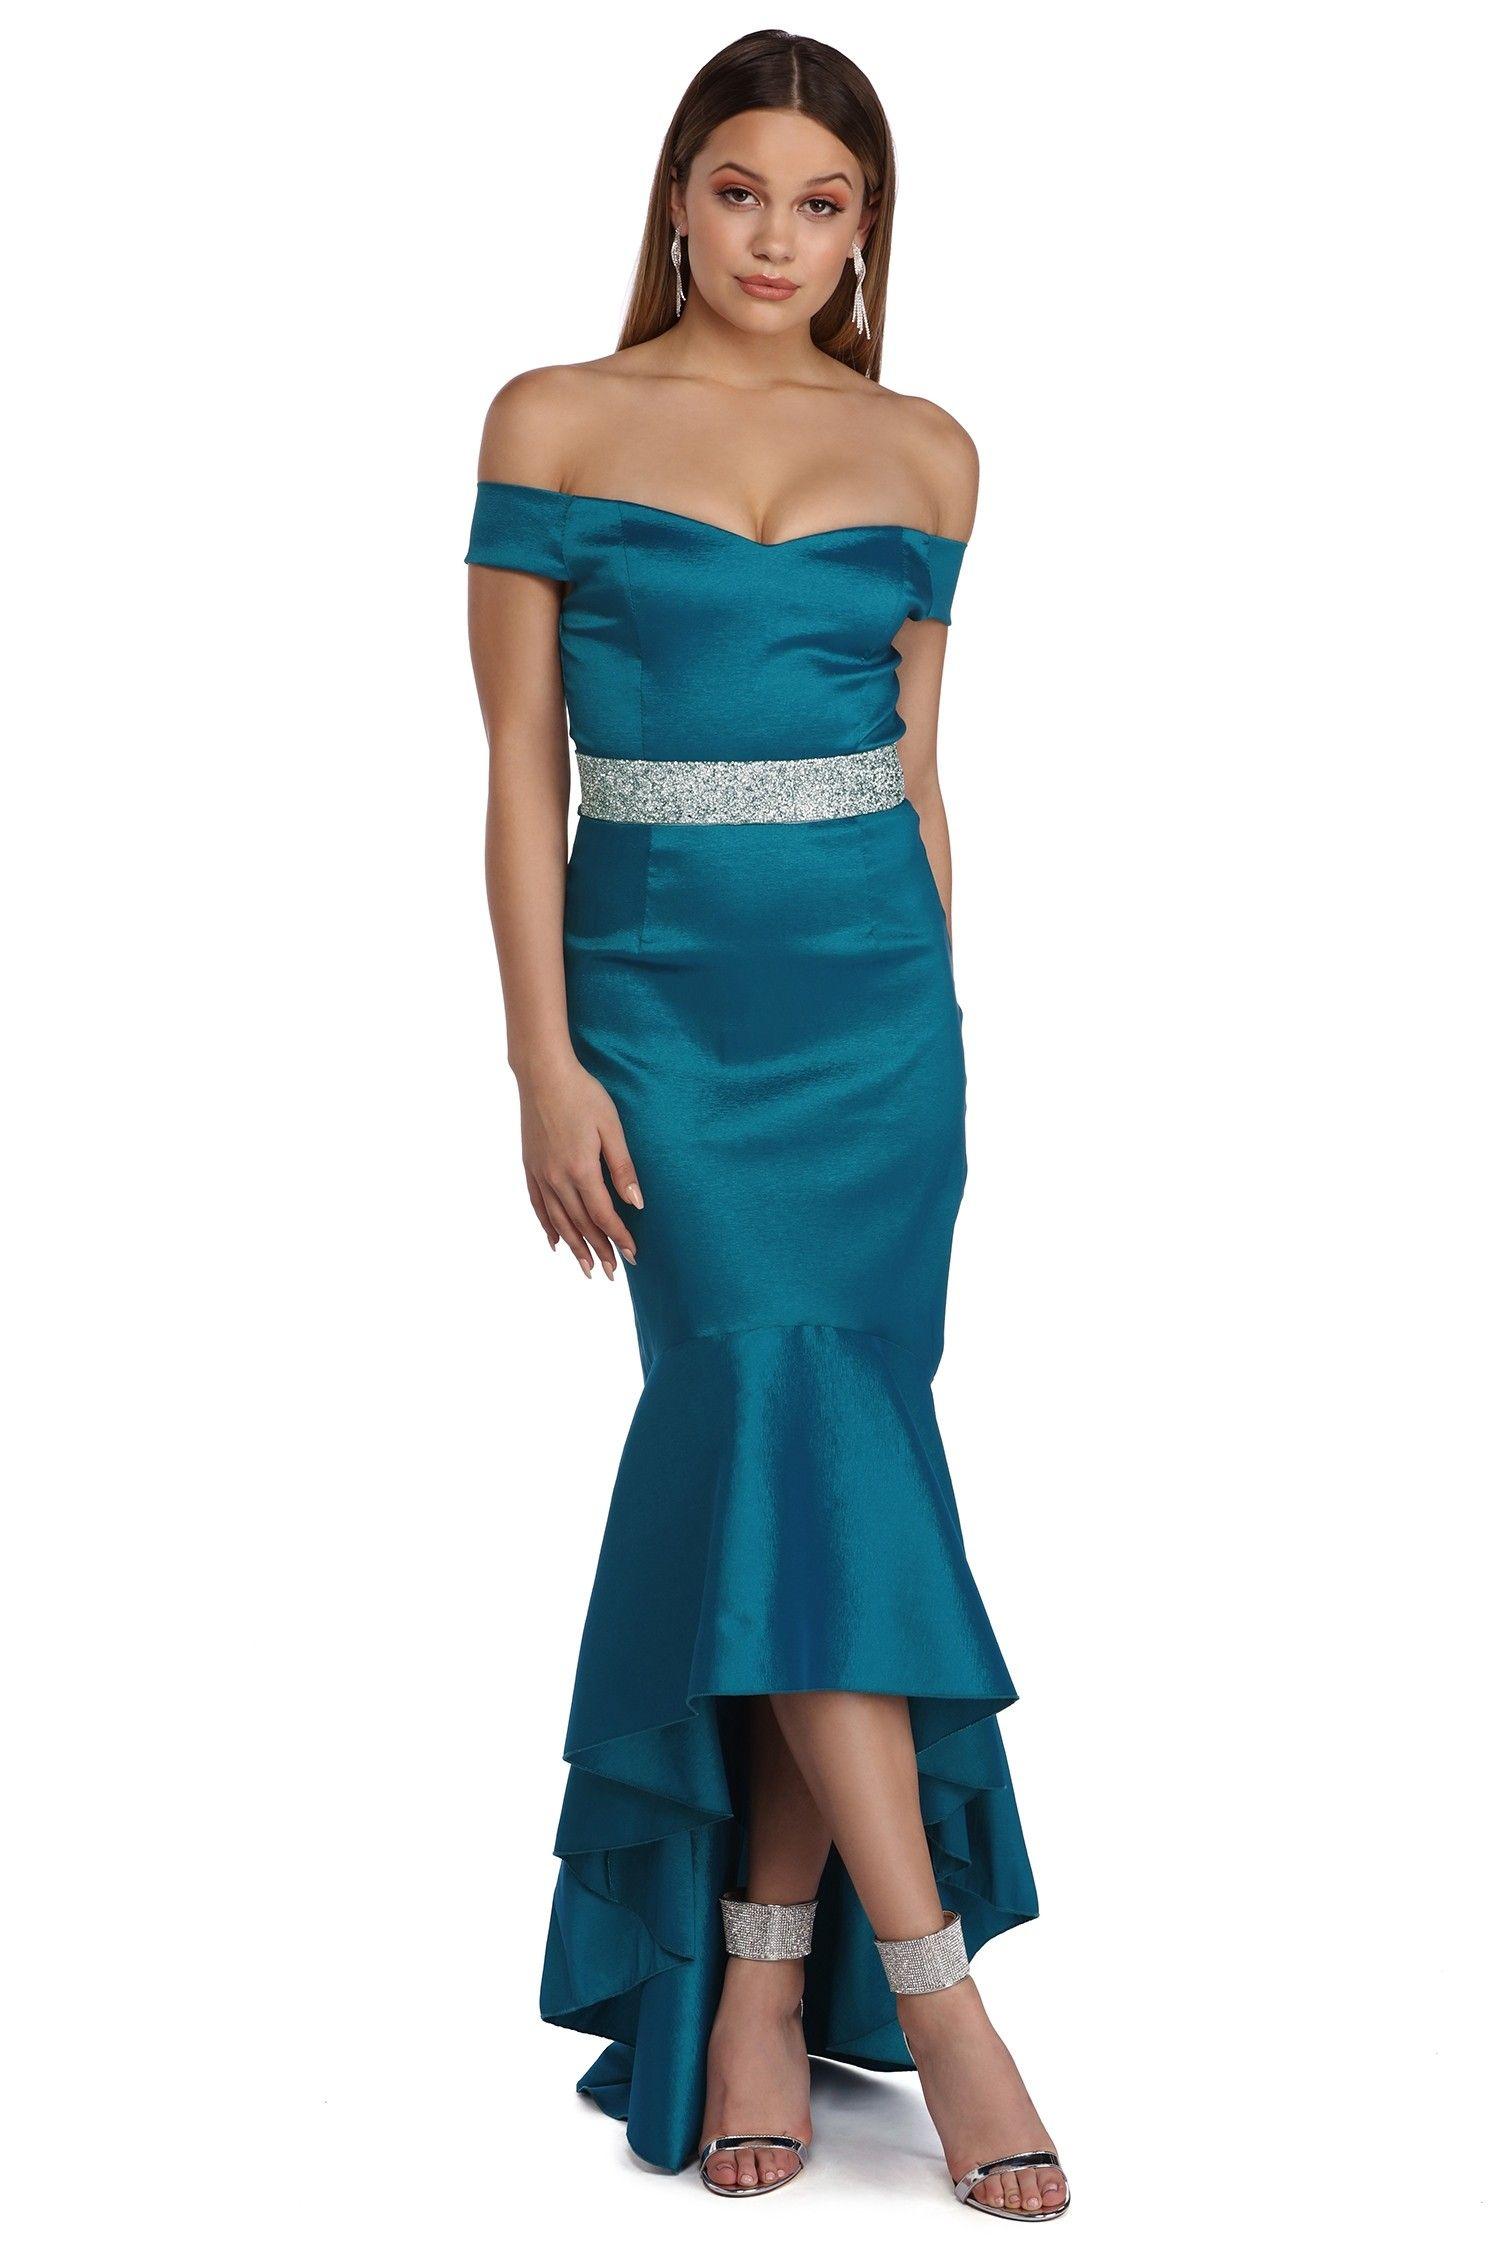 Zuri Teal Sweetheart High Low Taffeta Dress   Taffeta dress, High ...